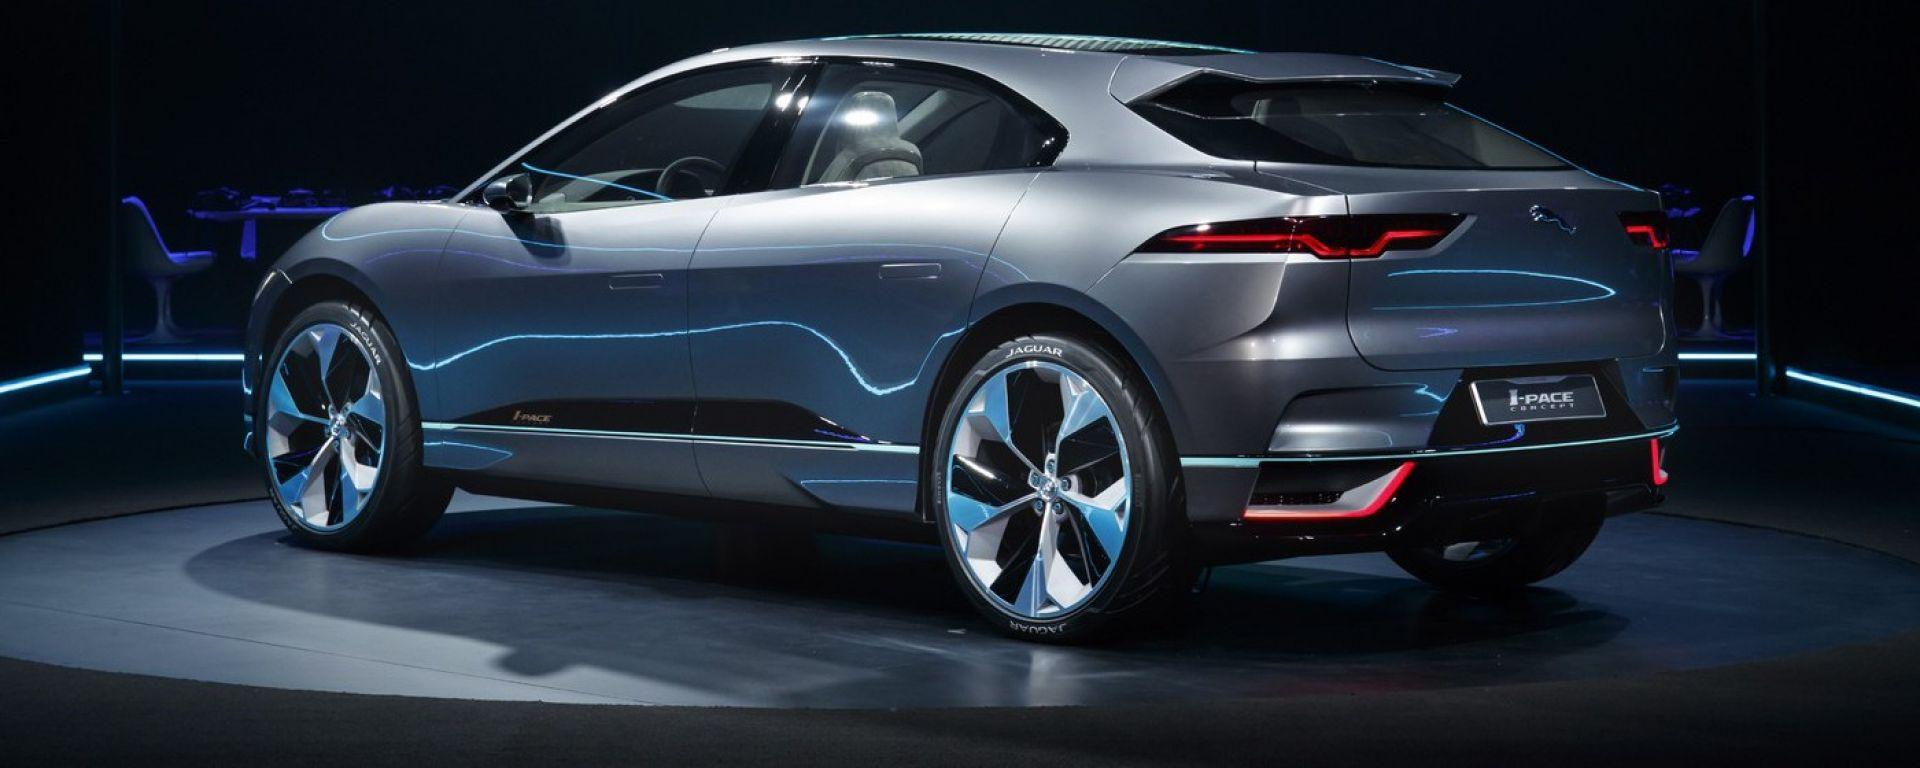 Jaguar i-Pace concept, le prime immagini e info